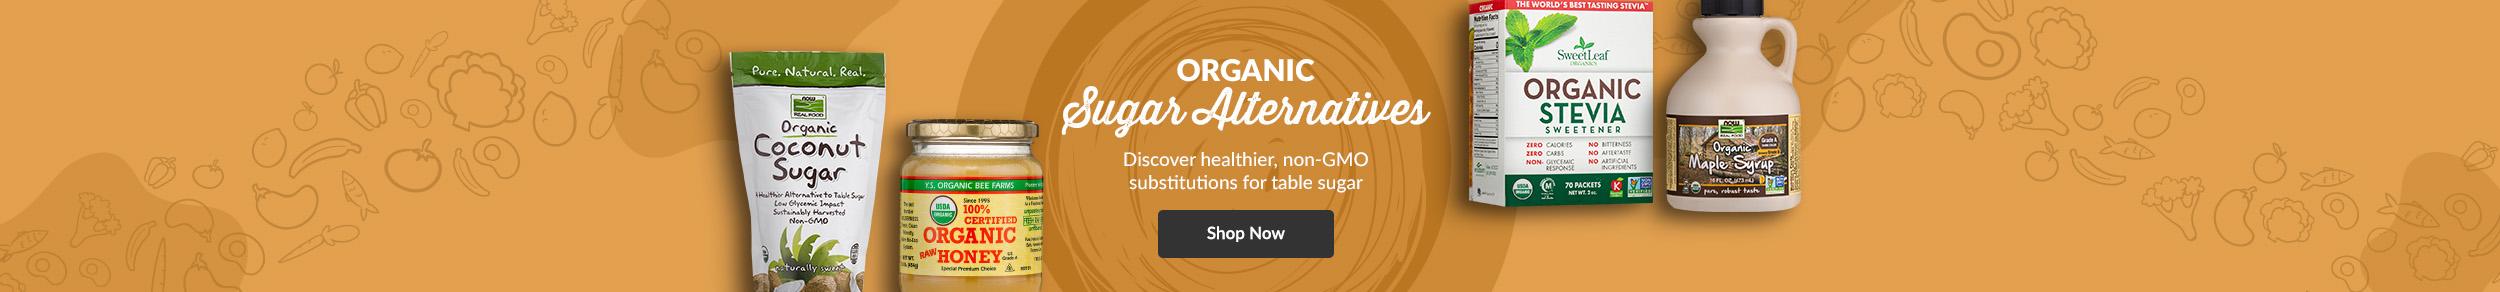 https://i3.pureformulas.net/images/static/Organic-Sugar-Alternatives_Food-4_092118.jpg